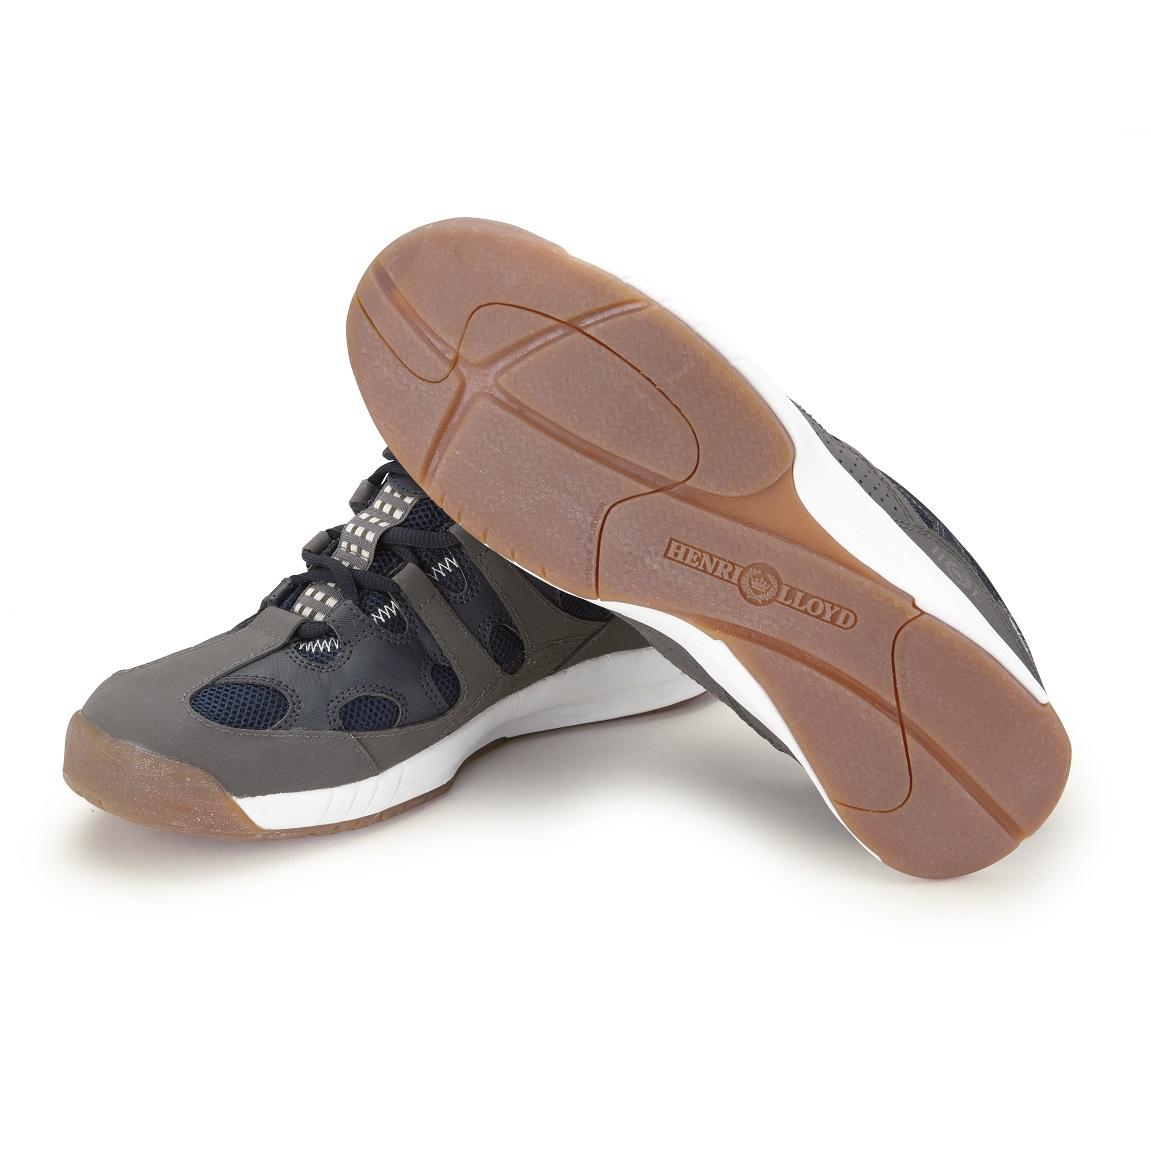 Henri Lloyd Deck Grip Profile Deck Schuhe In Navy Yf600001